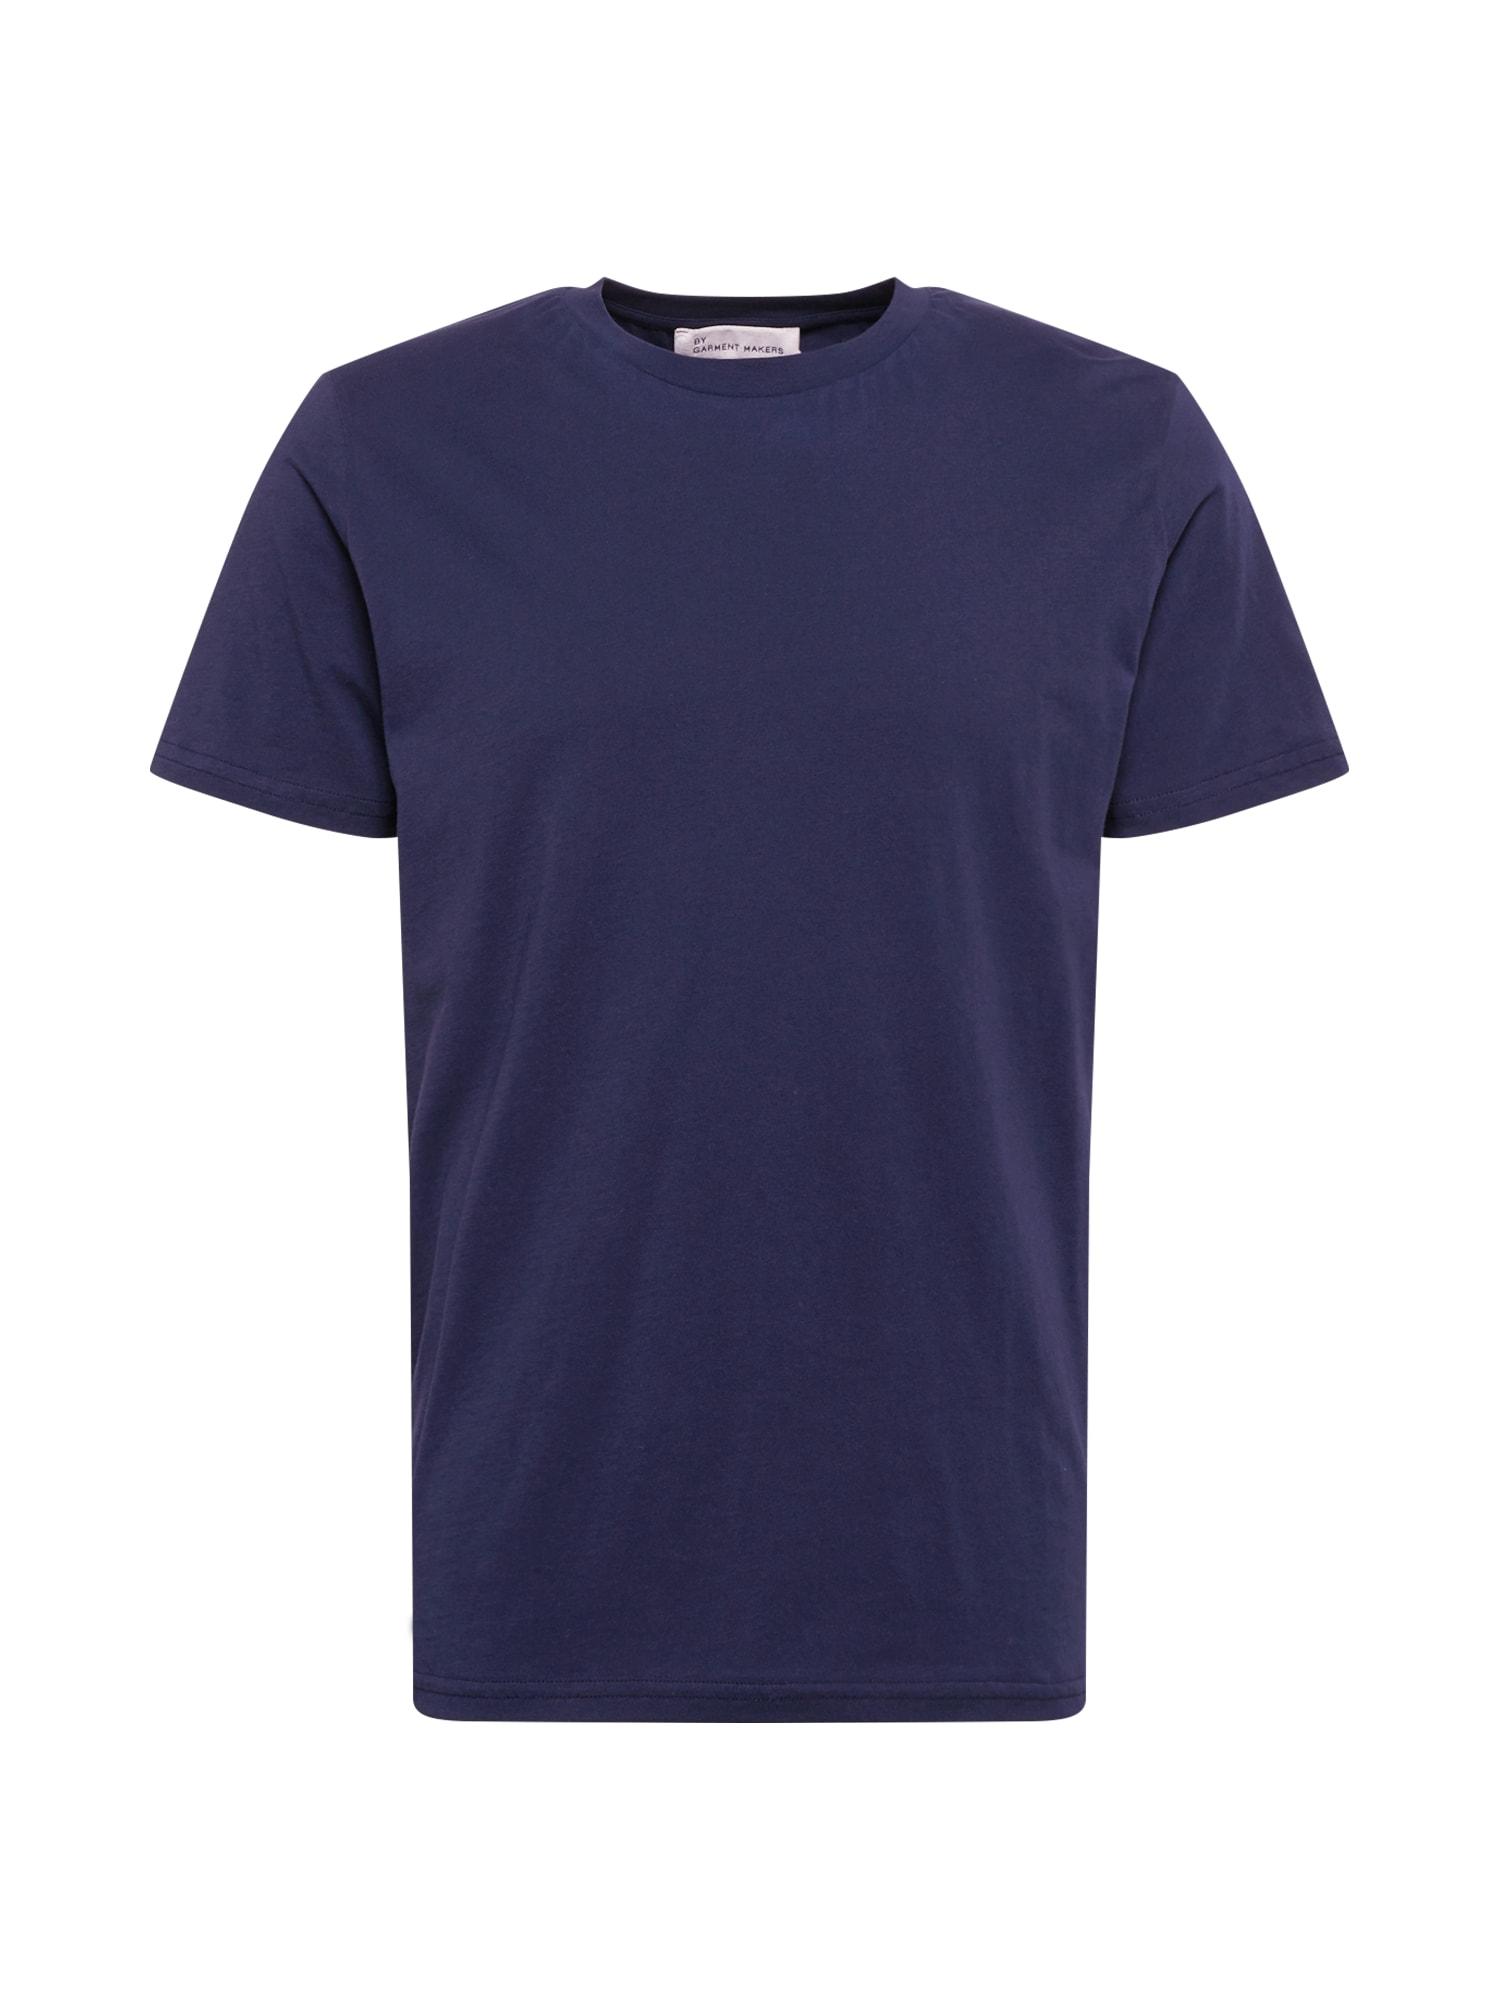 By Garment Makers Marškinėliai tamsiai mėlyna